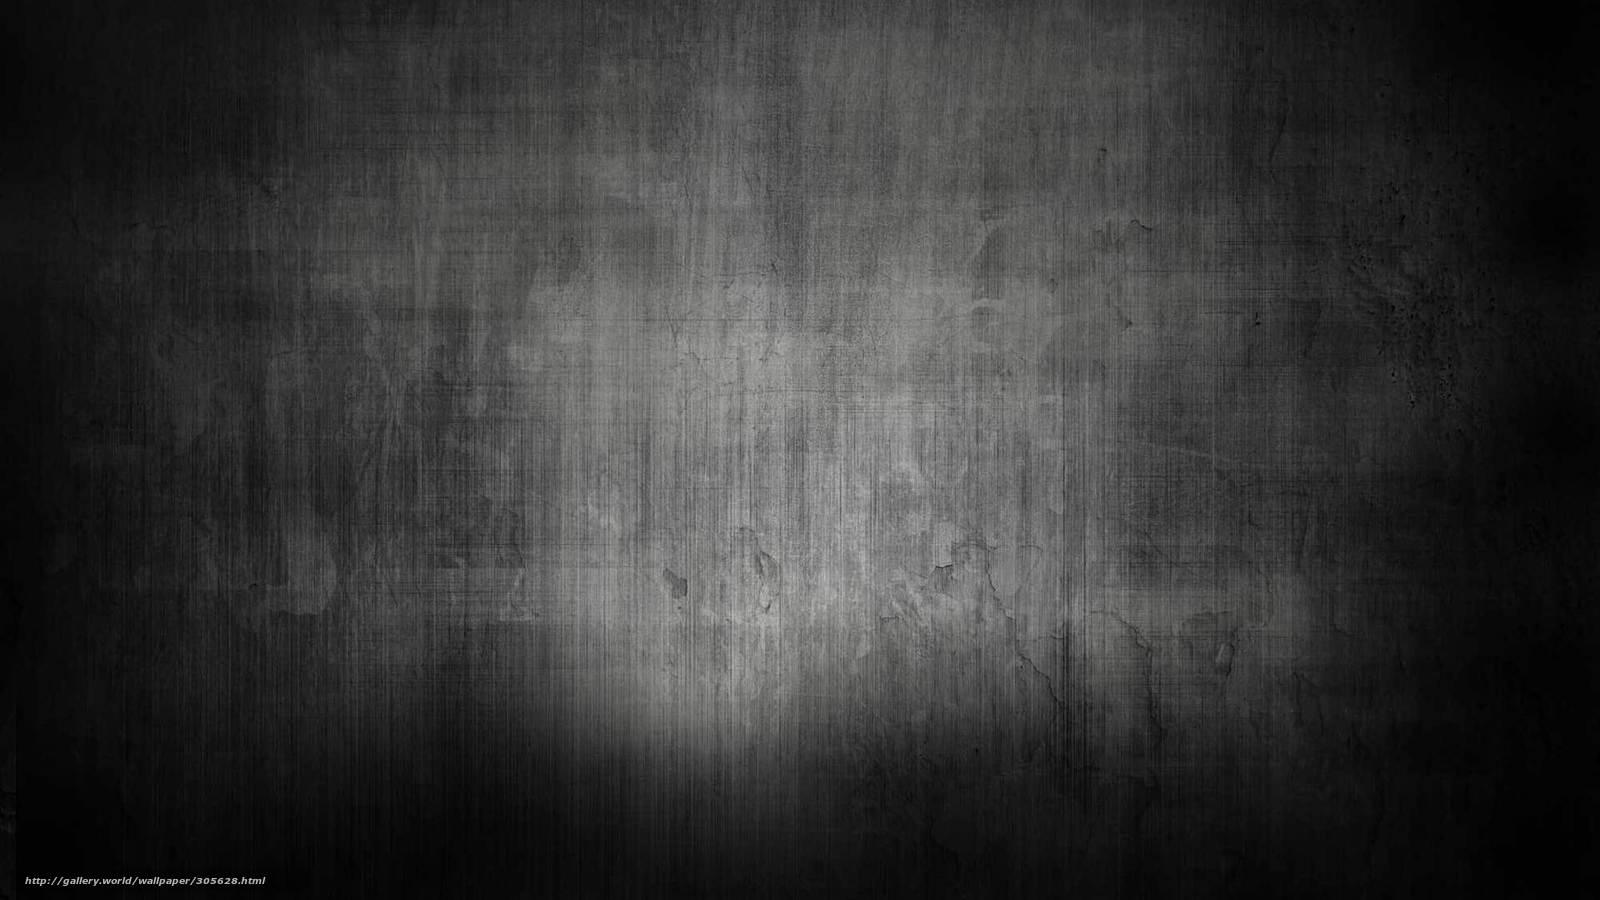 gris hq fondo negro - photo #1